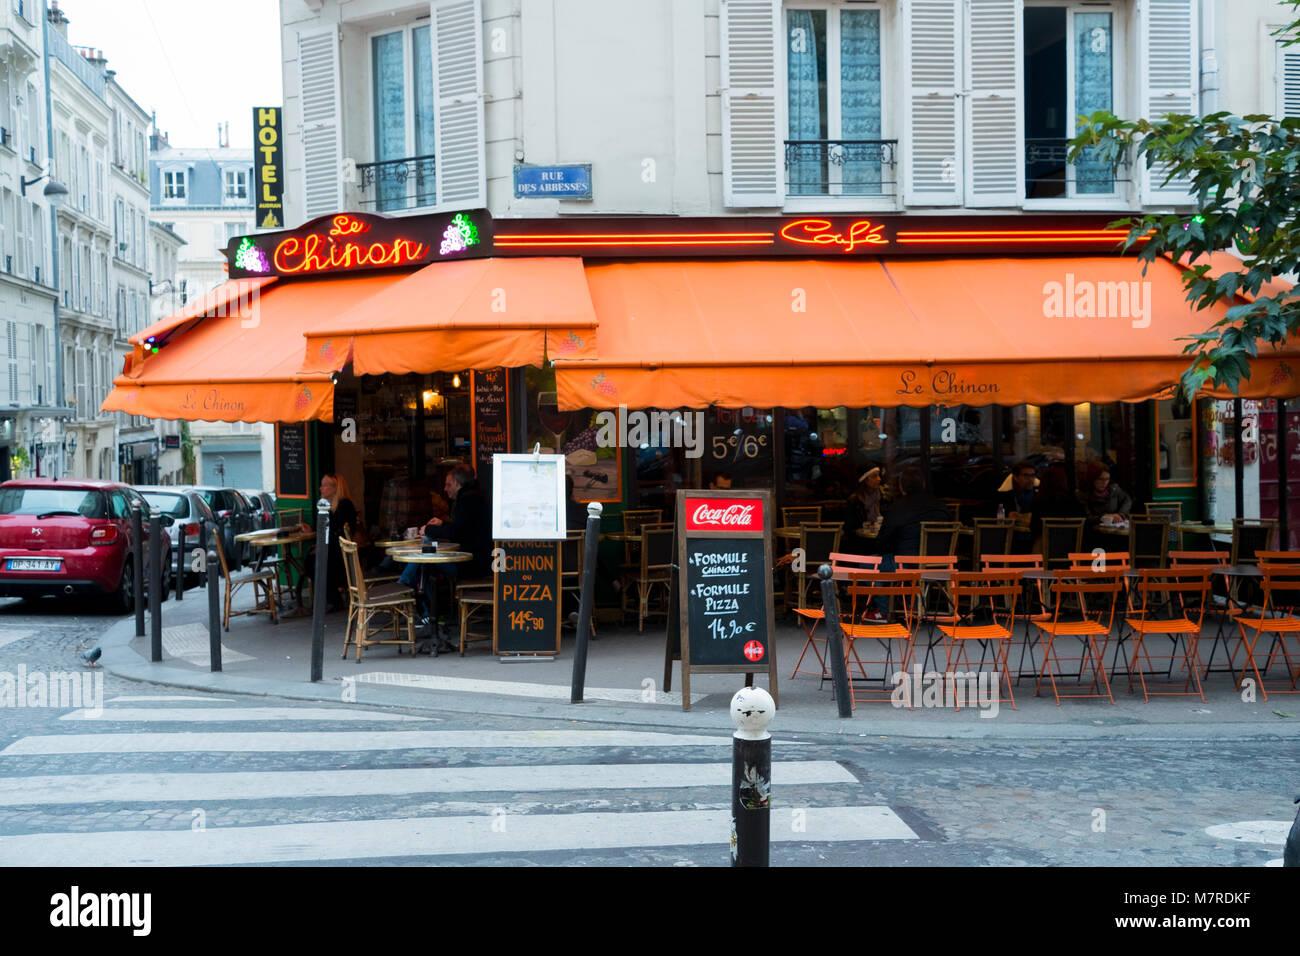 Paris Cafe Outdoor Seating - Stock Image